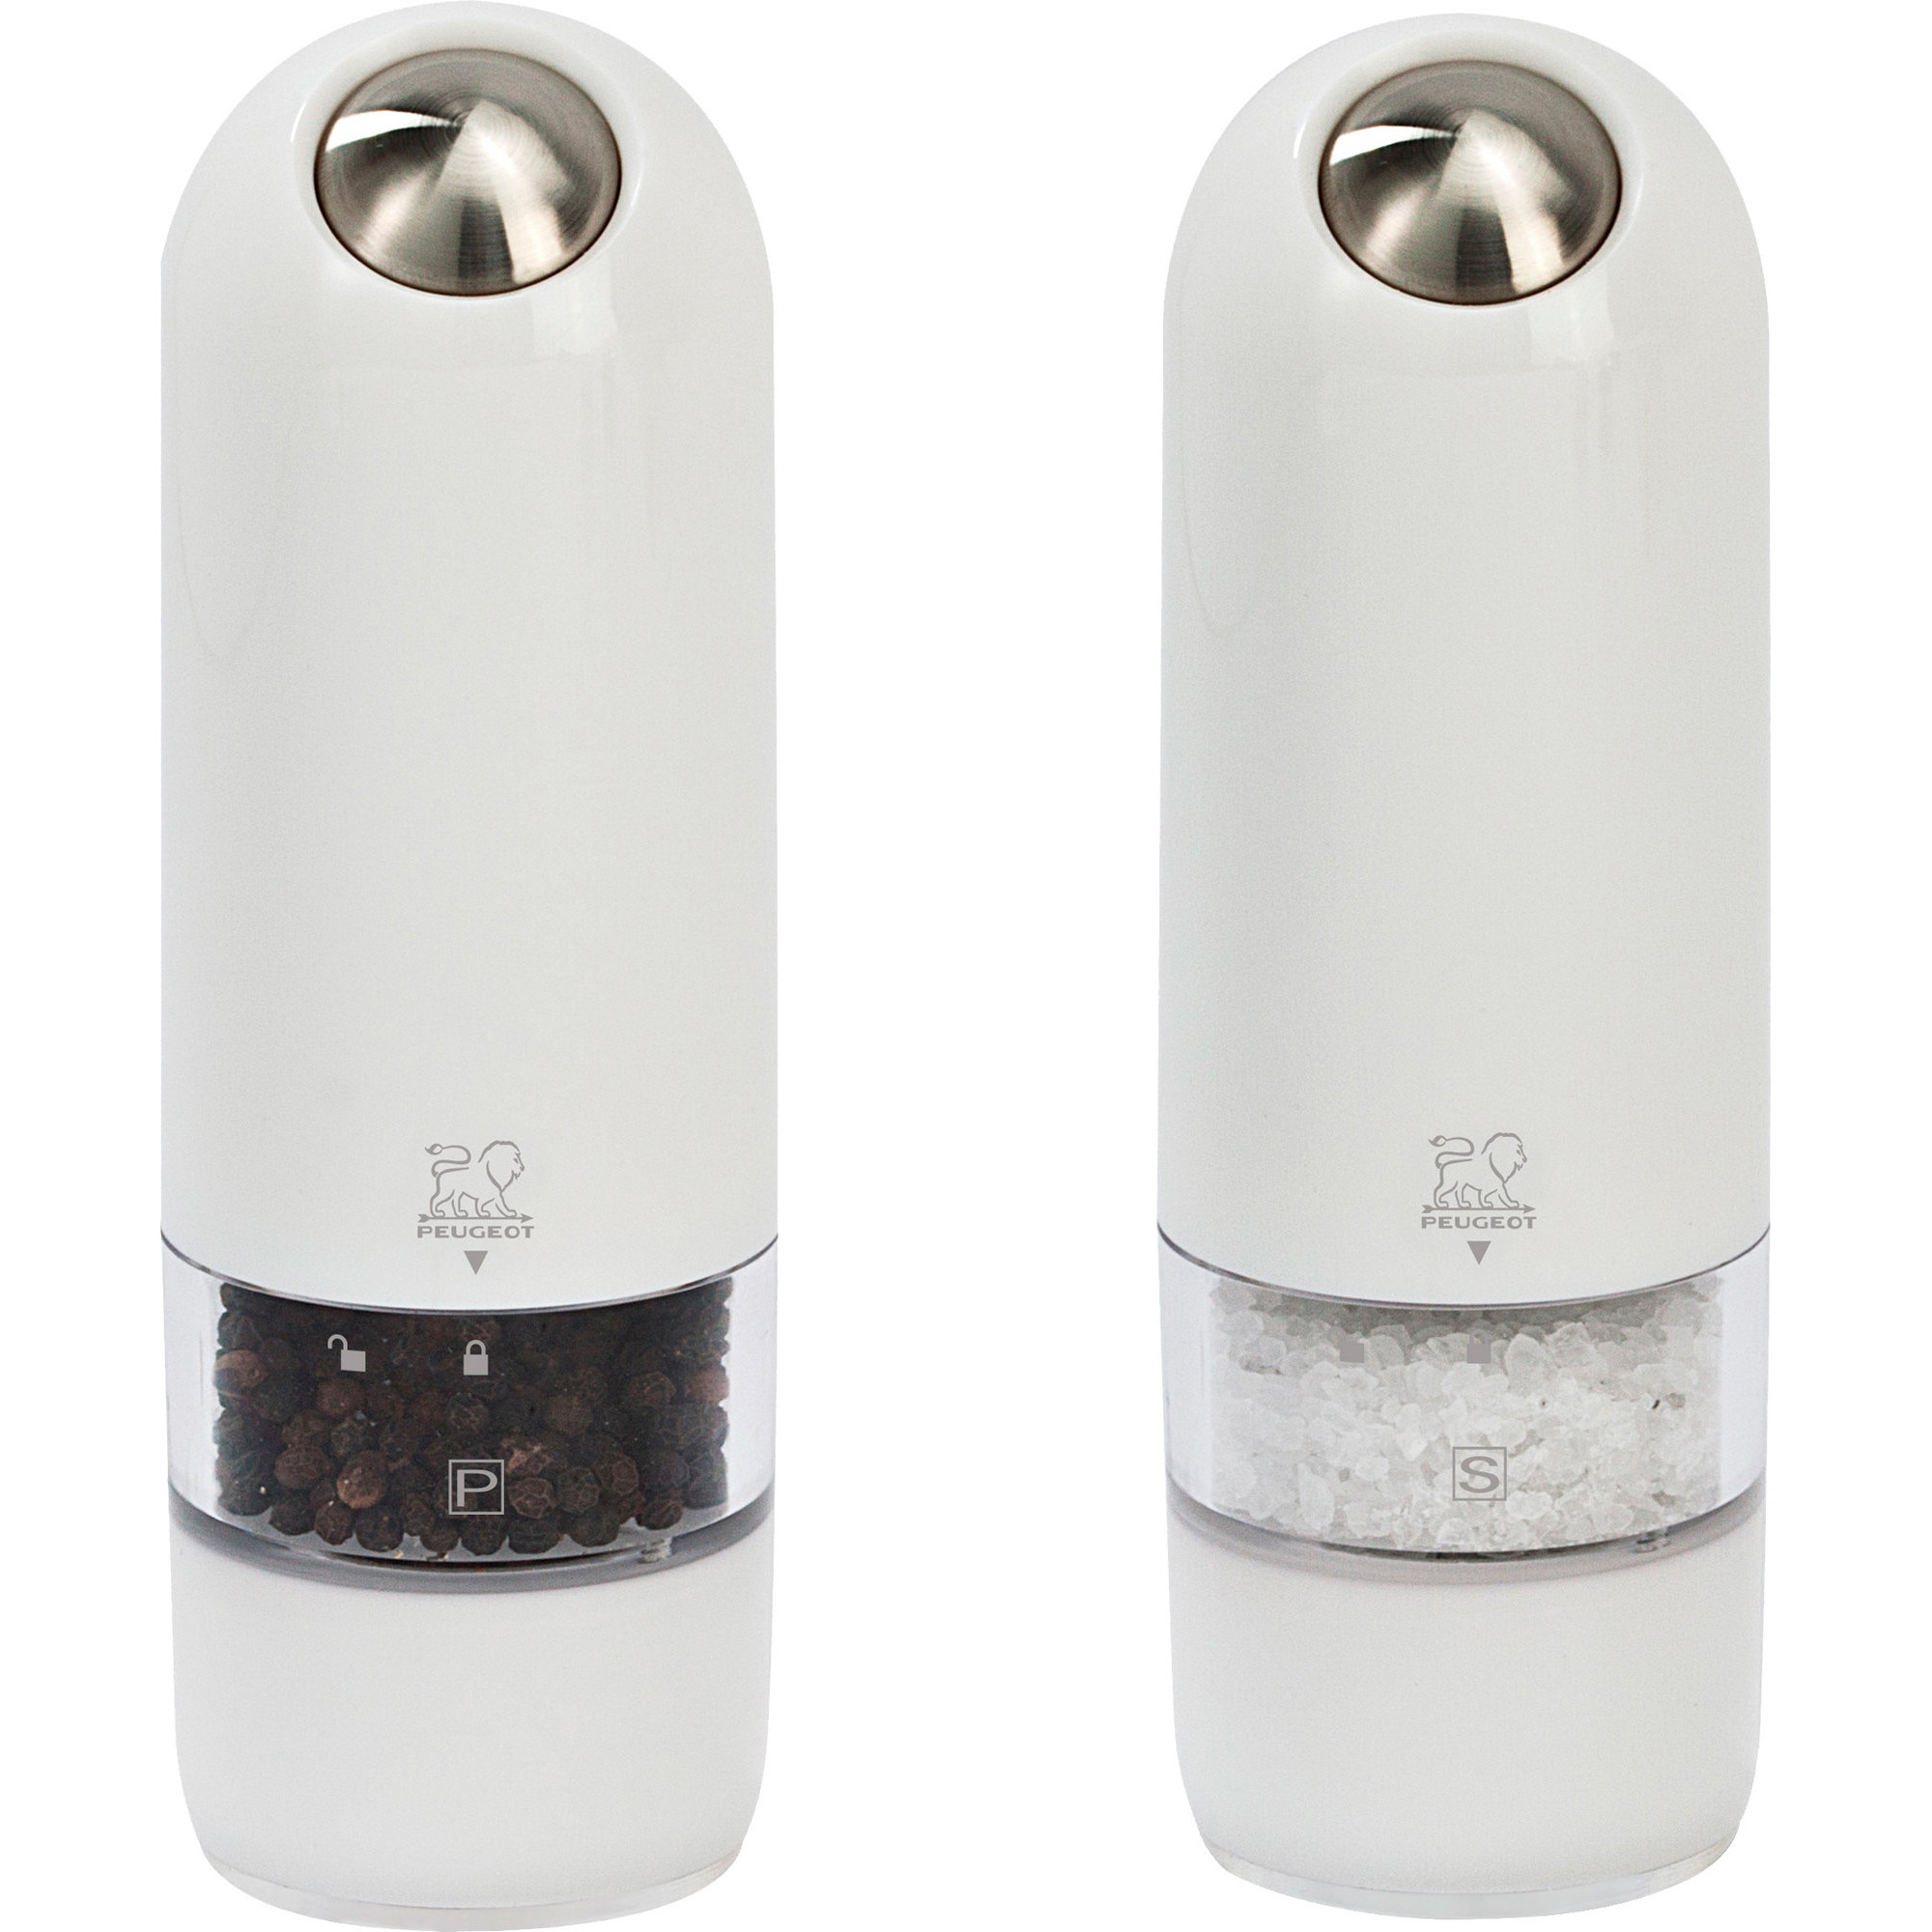 Peugeot Alaska Duo Elektrisk Salt- & Pepparkvarn 17 cm Vit